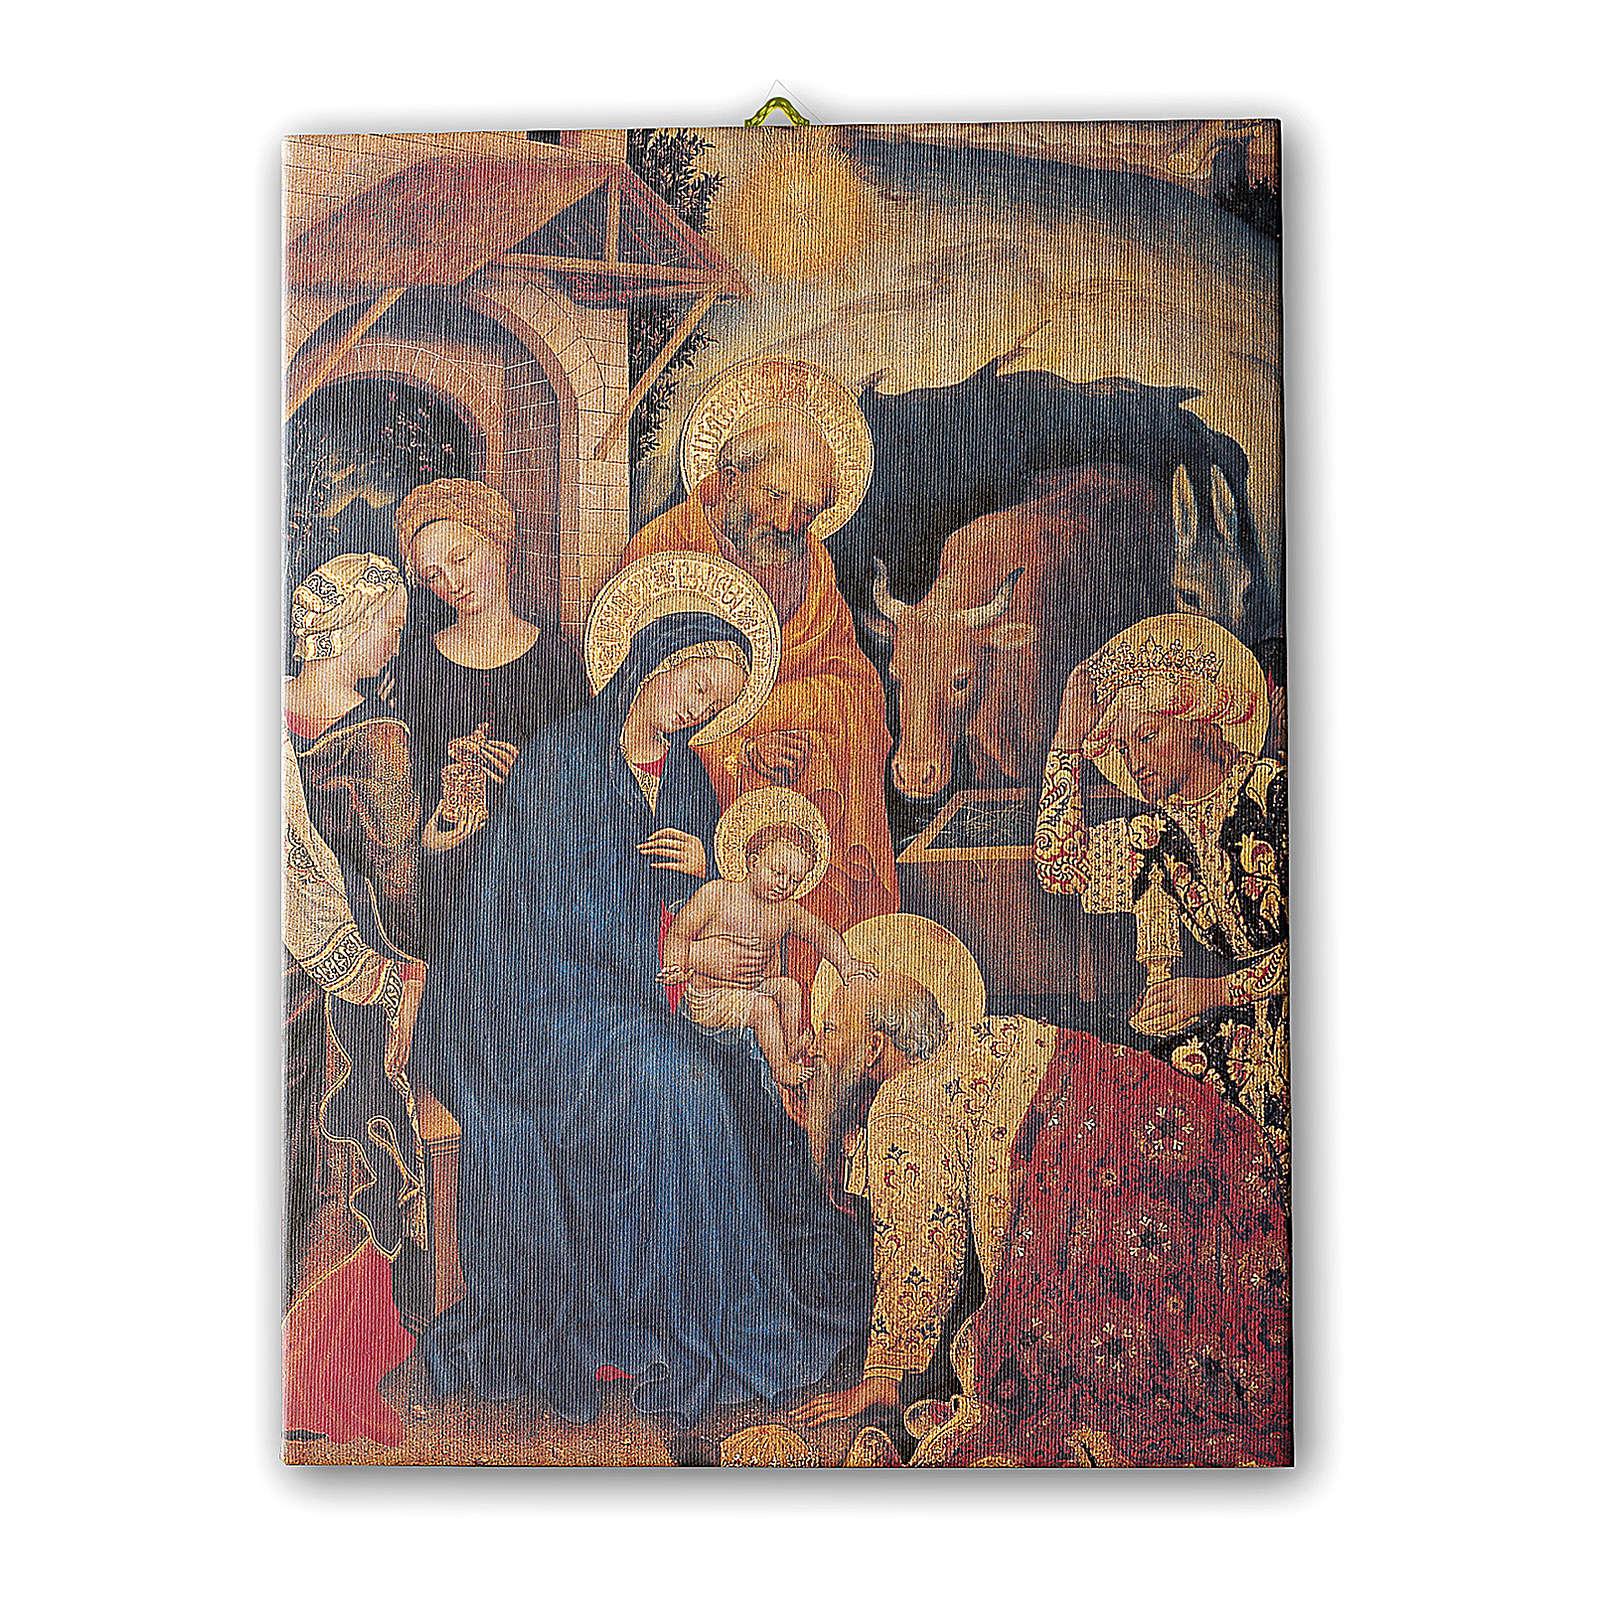 Adoration of the Magi by Gentile da Fabriano canvas print 25x20 cm 3